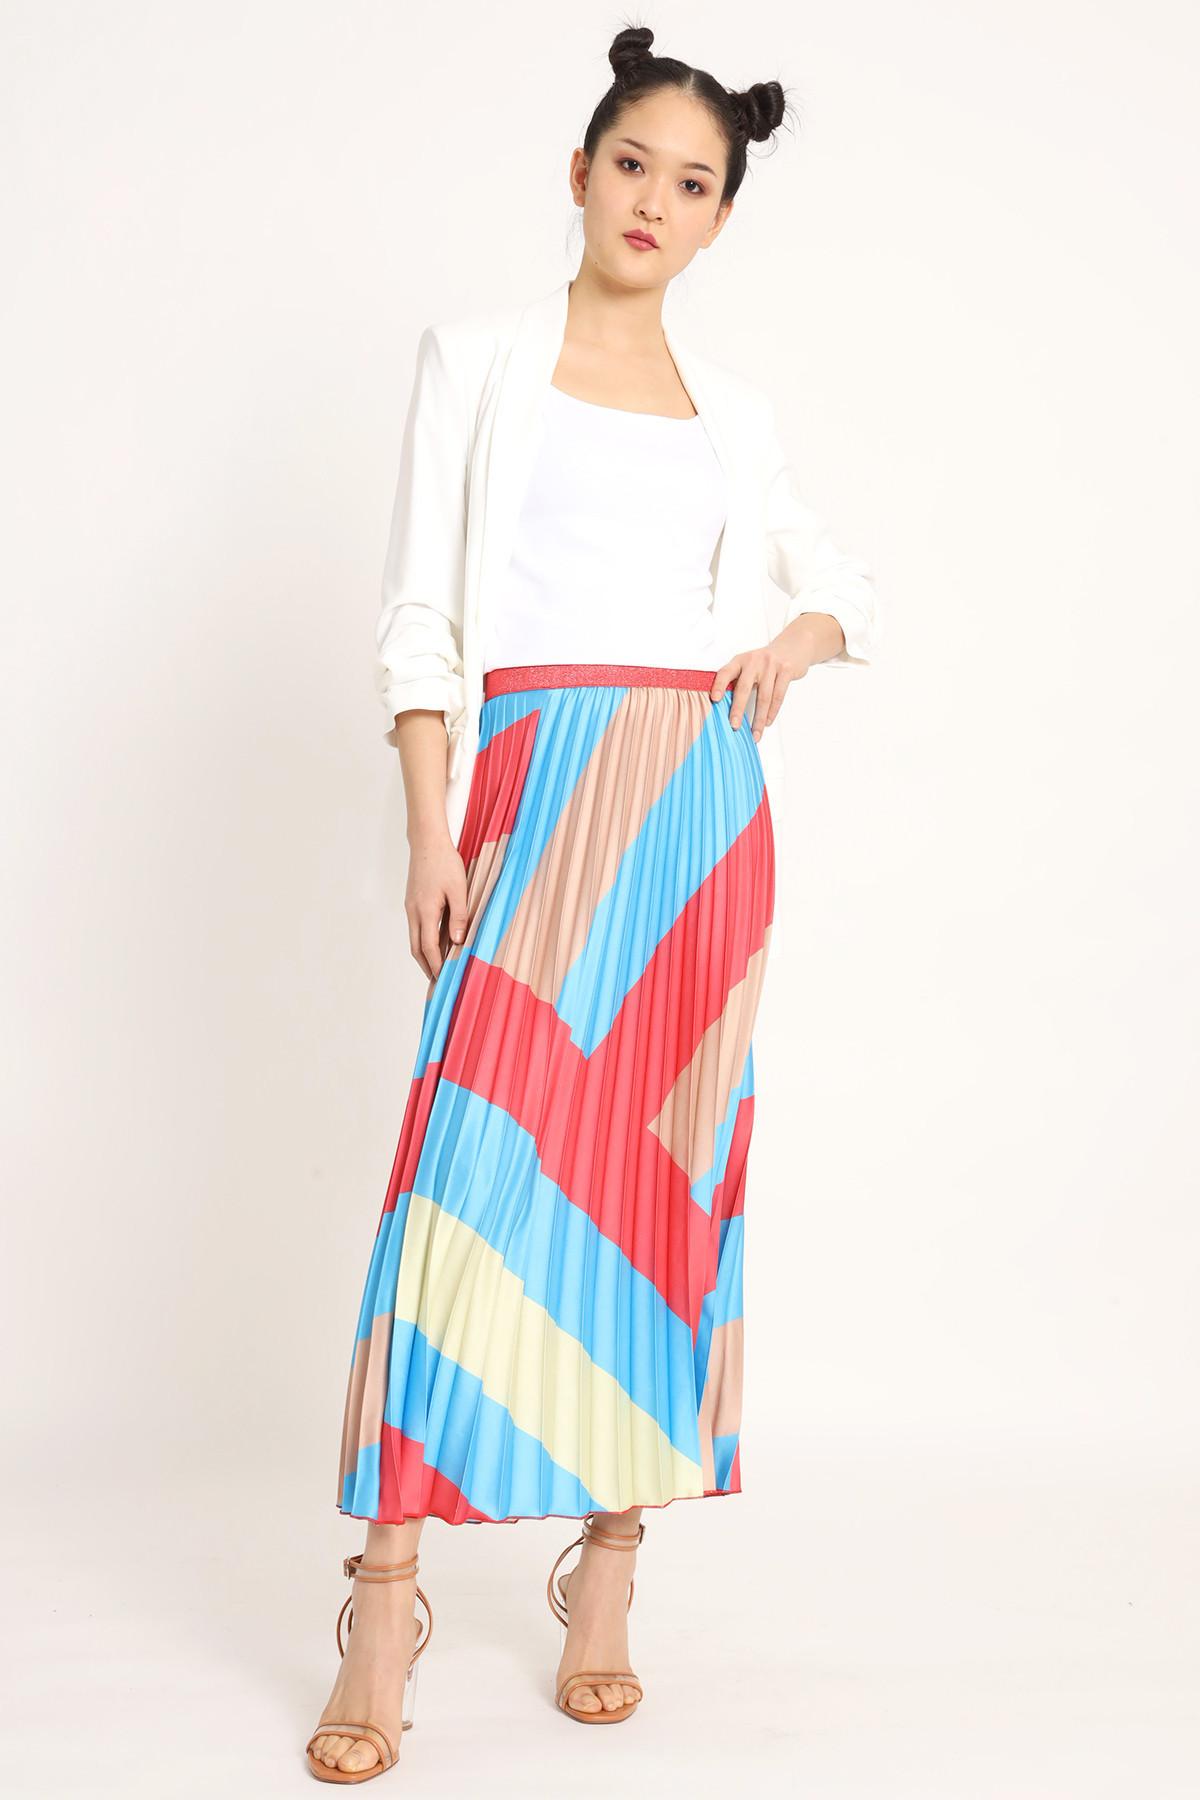 Pleated Satin Skirt in Fantasy